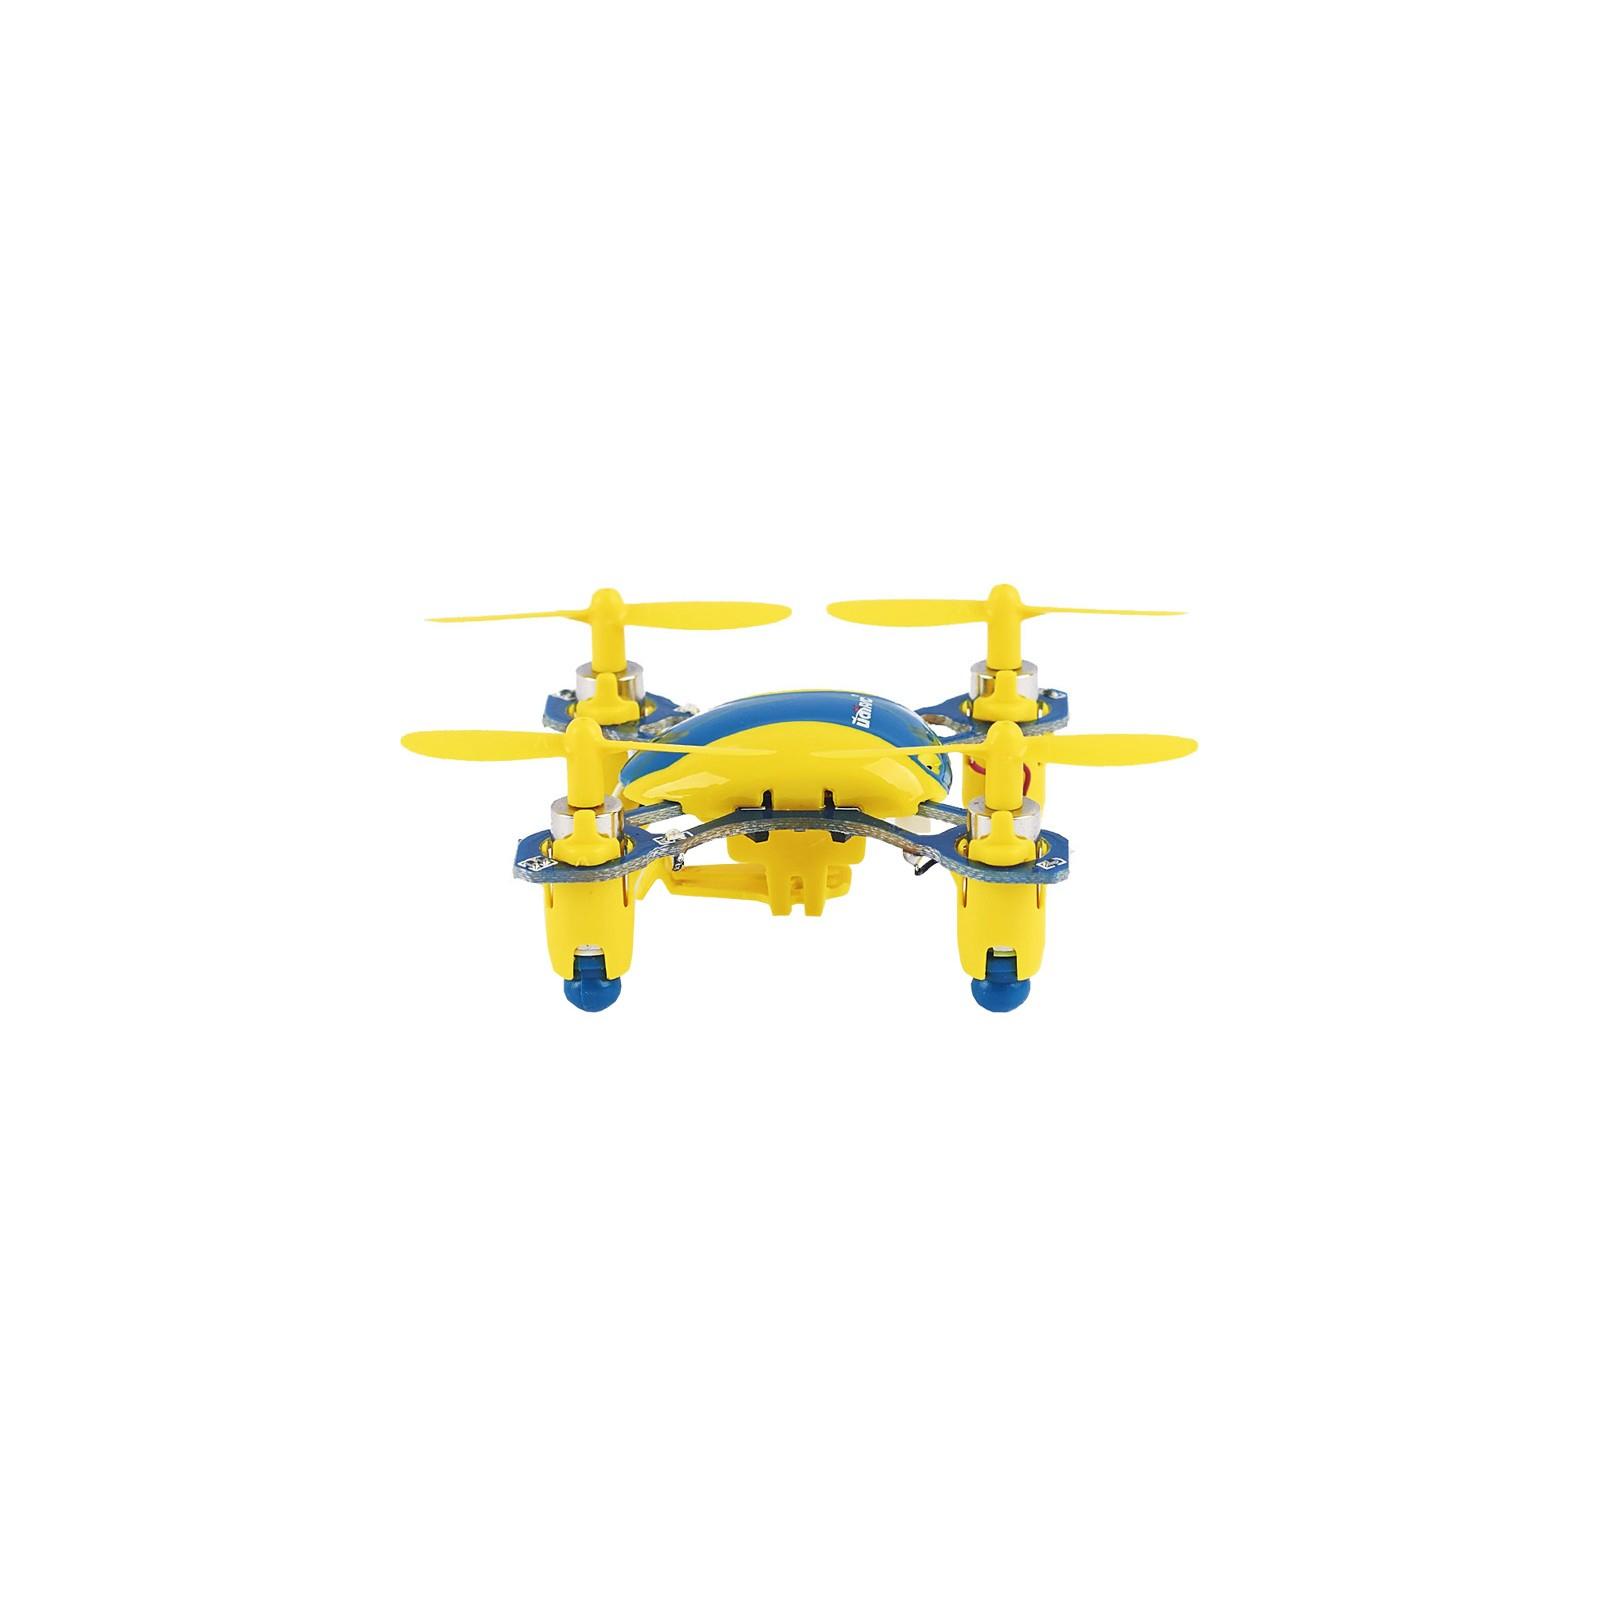 Квадрокоптер UDIRC 2,4 GHz 40 мм мини 3.7V (U840 Yellow/Blue) изображение 4